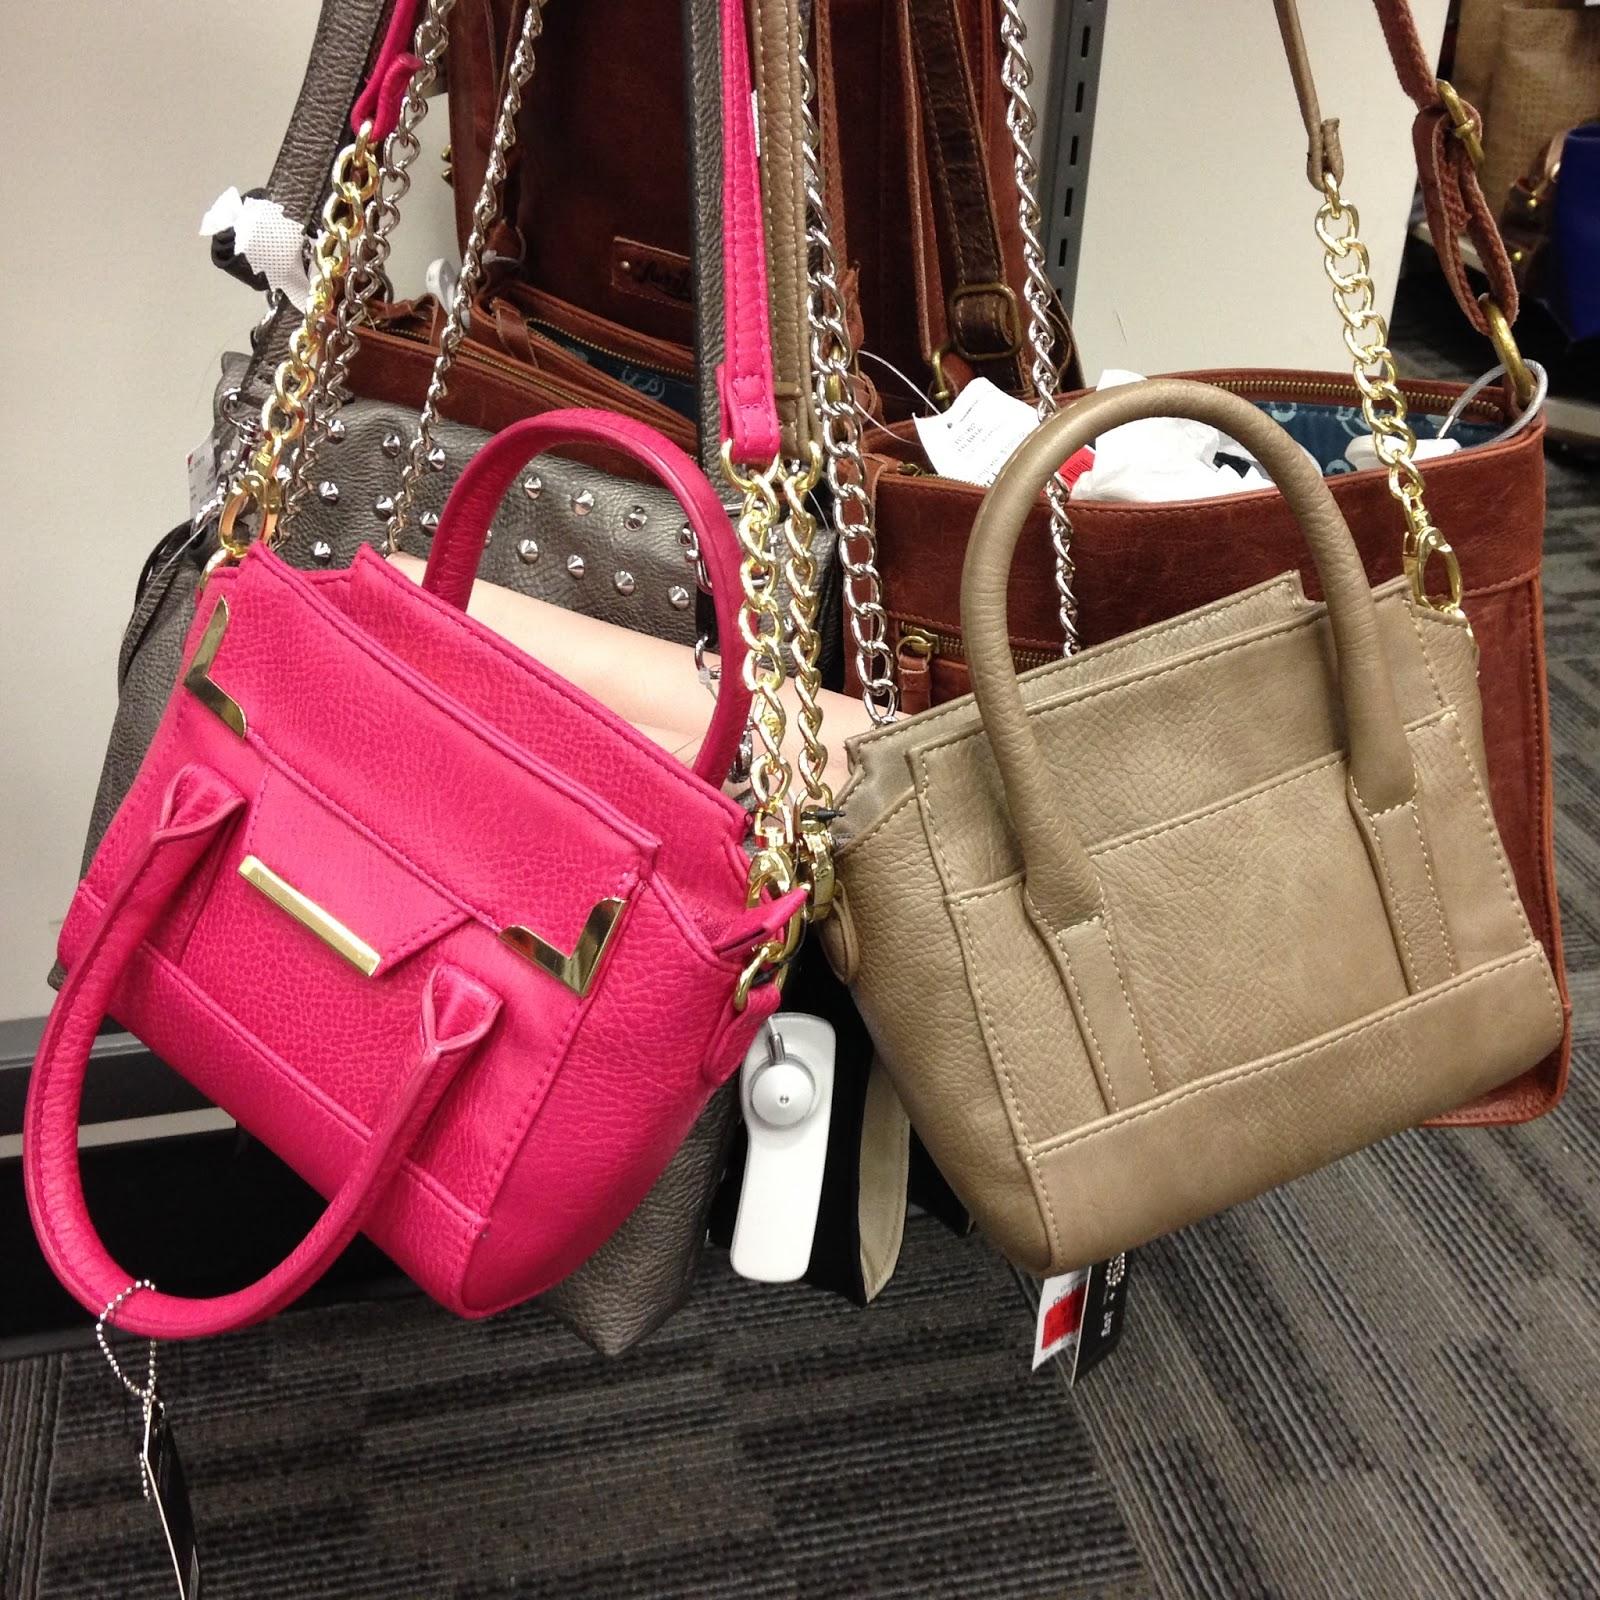 More Olivia Joy Bags